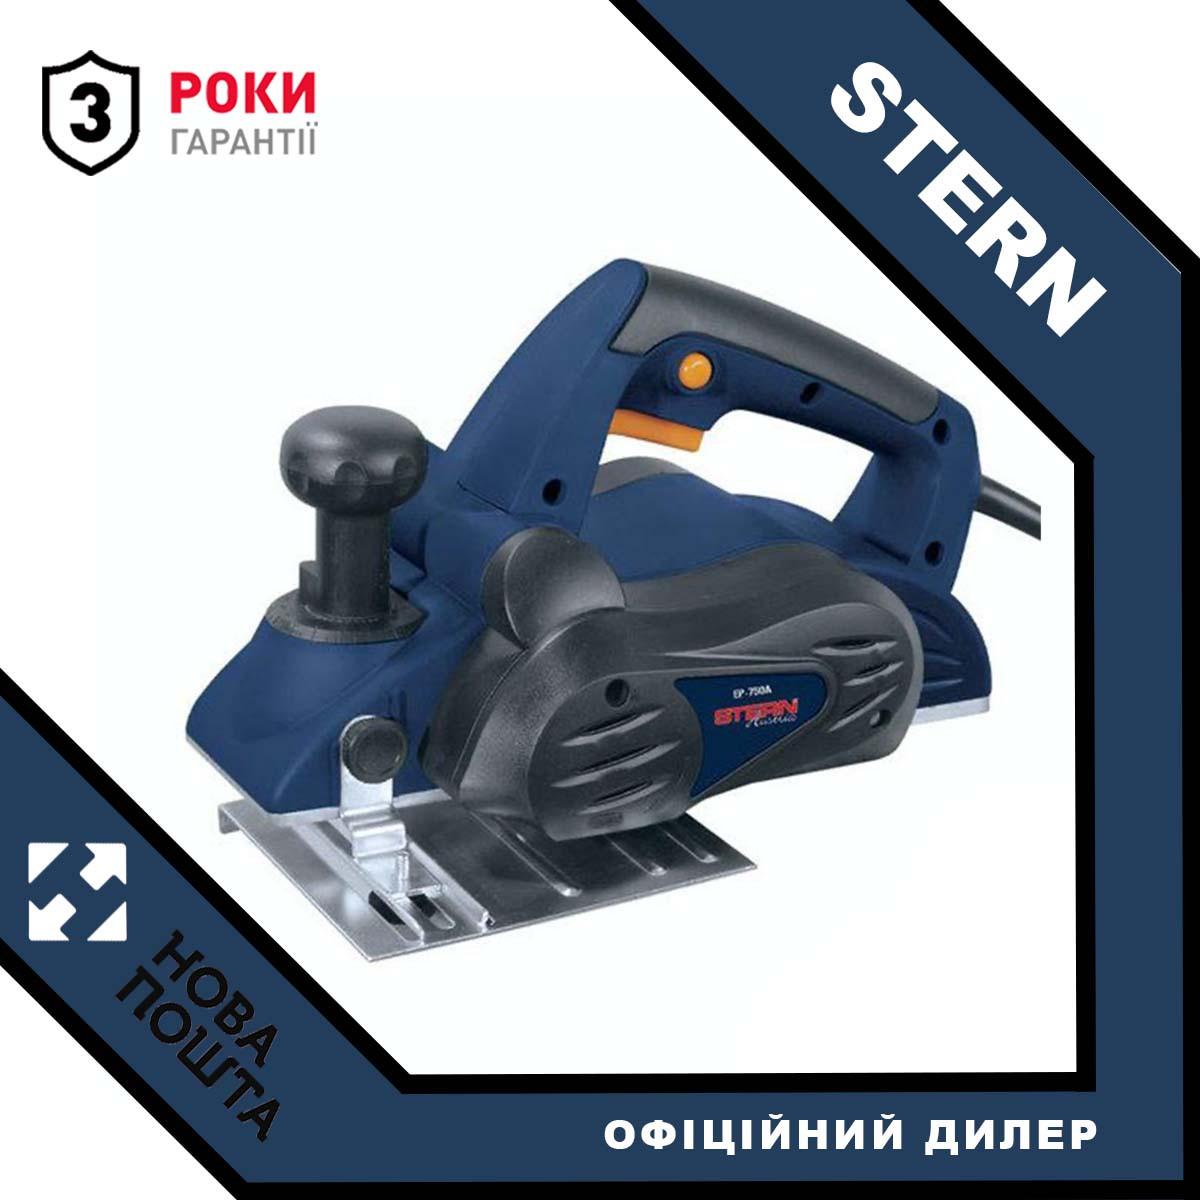 Електрорубанок STERN EP-750 A